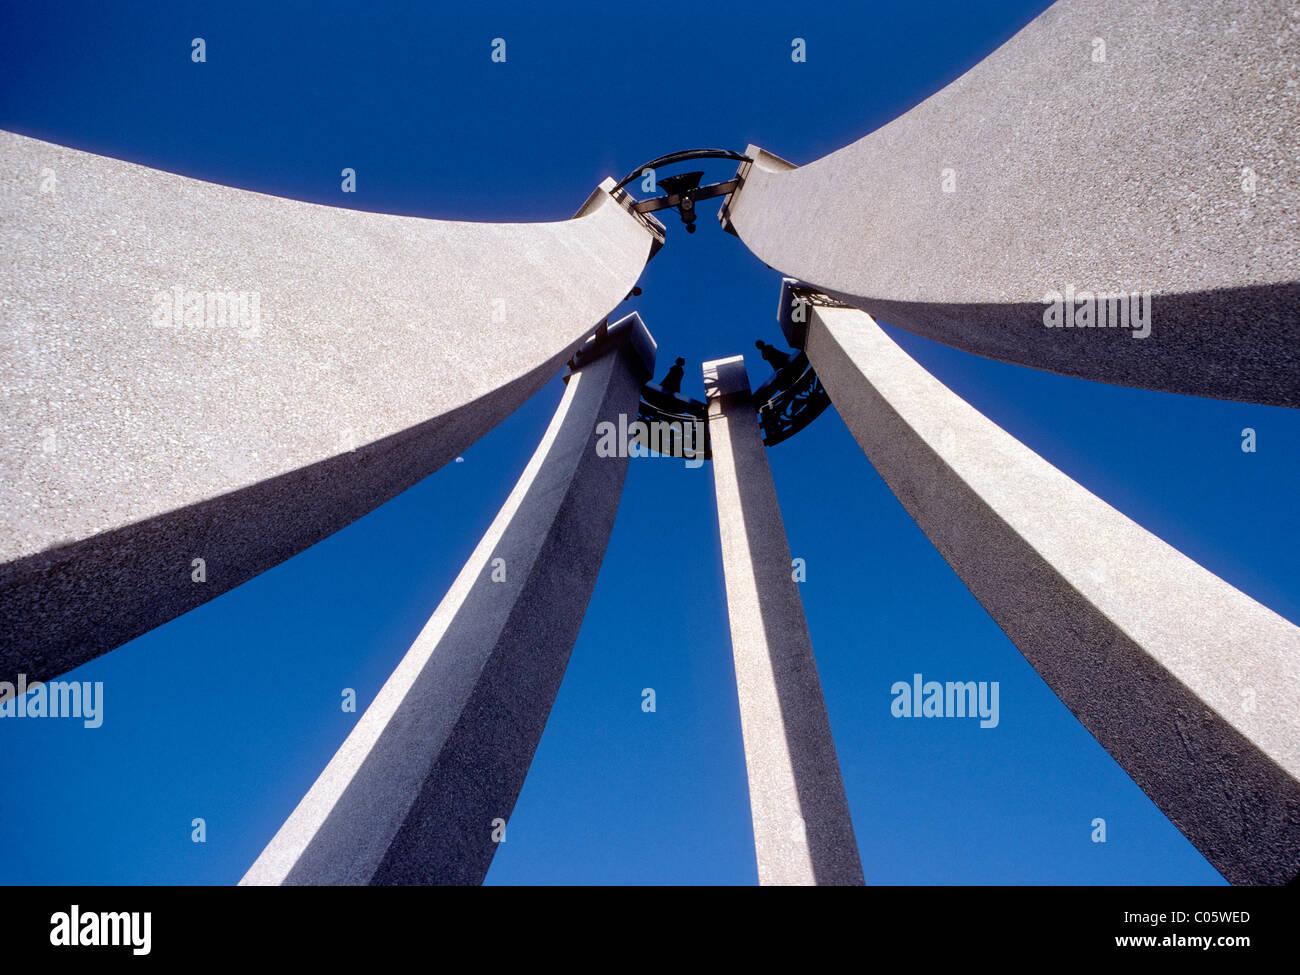 Monument at Garden of the Gods park, Colorado Springs, Colorado, USA - Stock Image